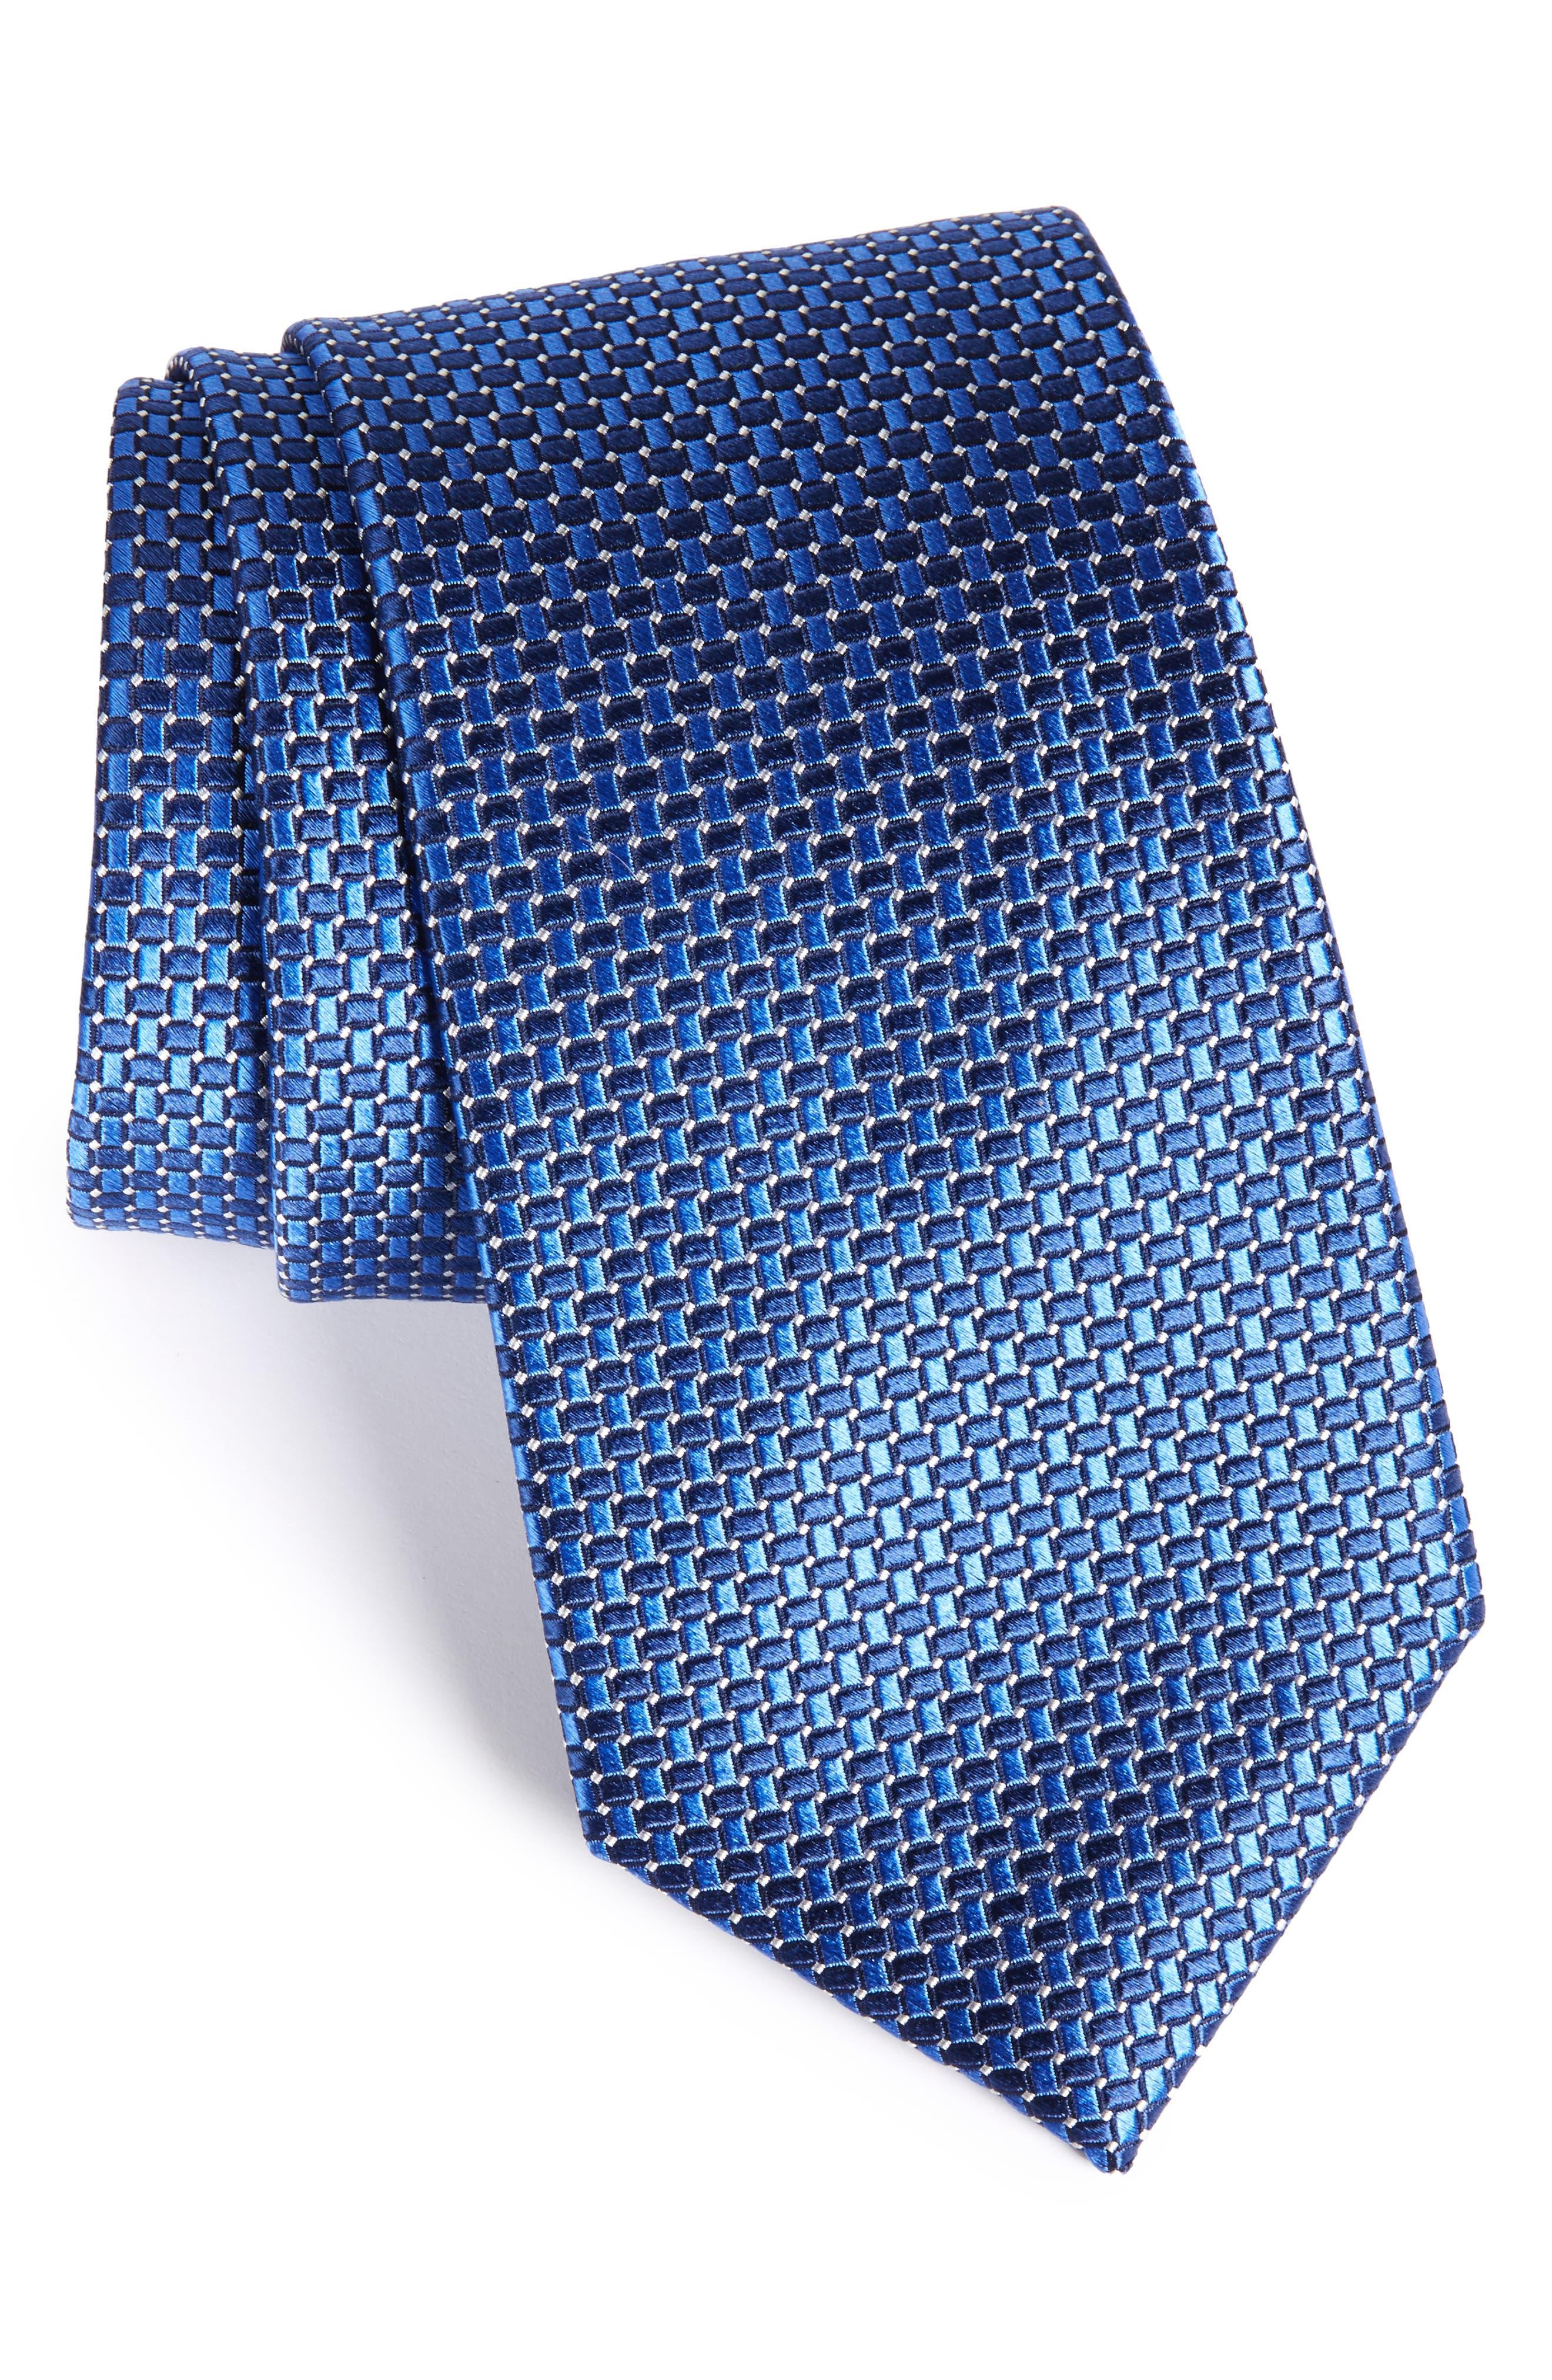 Nordstrom Men's Shop 'Small Basket Weave Neat' Woven Silk Tie